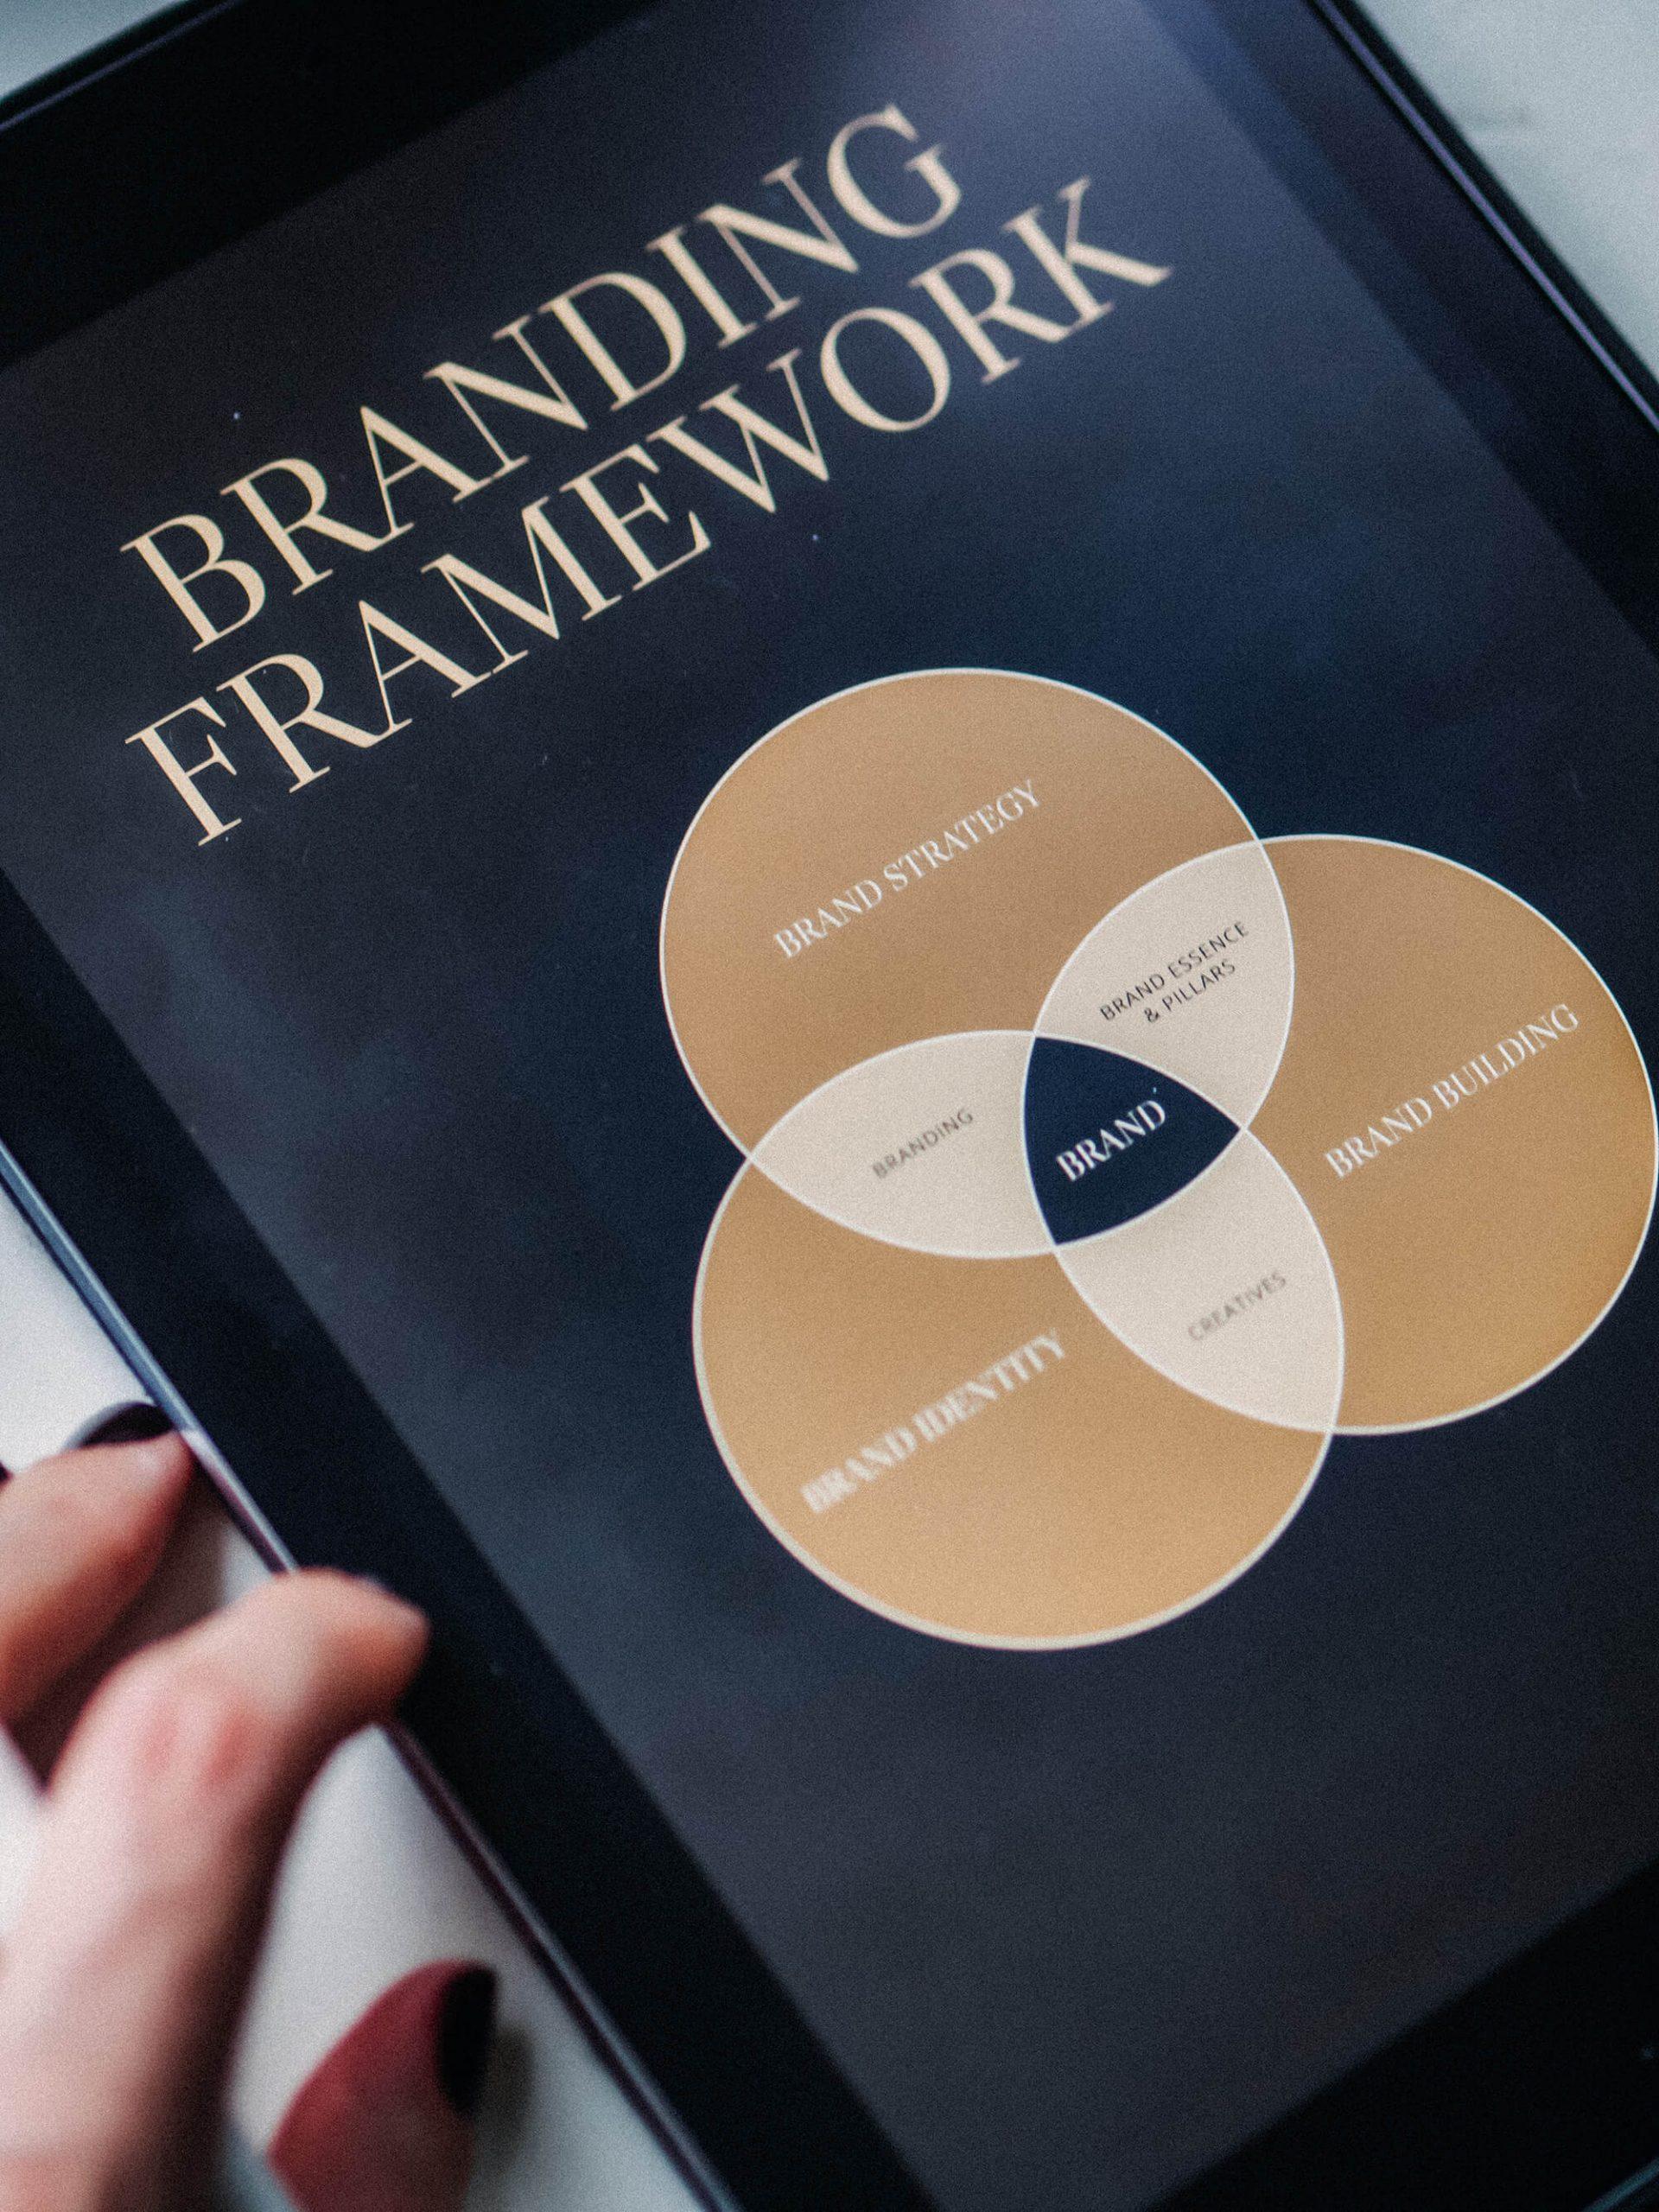 Strategic Brand Building | Fiona Gobbo Creative | Brand building luxury brands with a brand strategy & customer journey